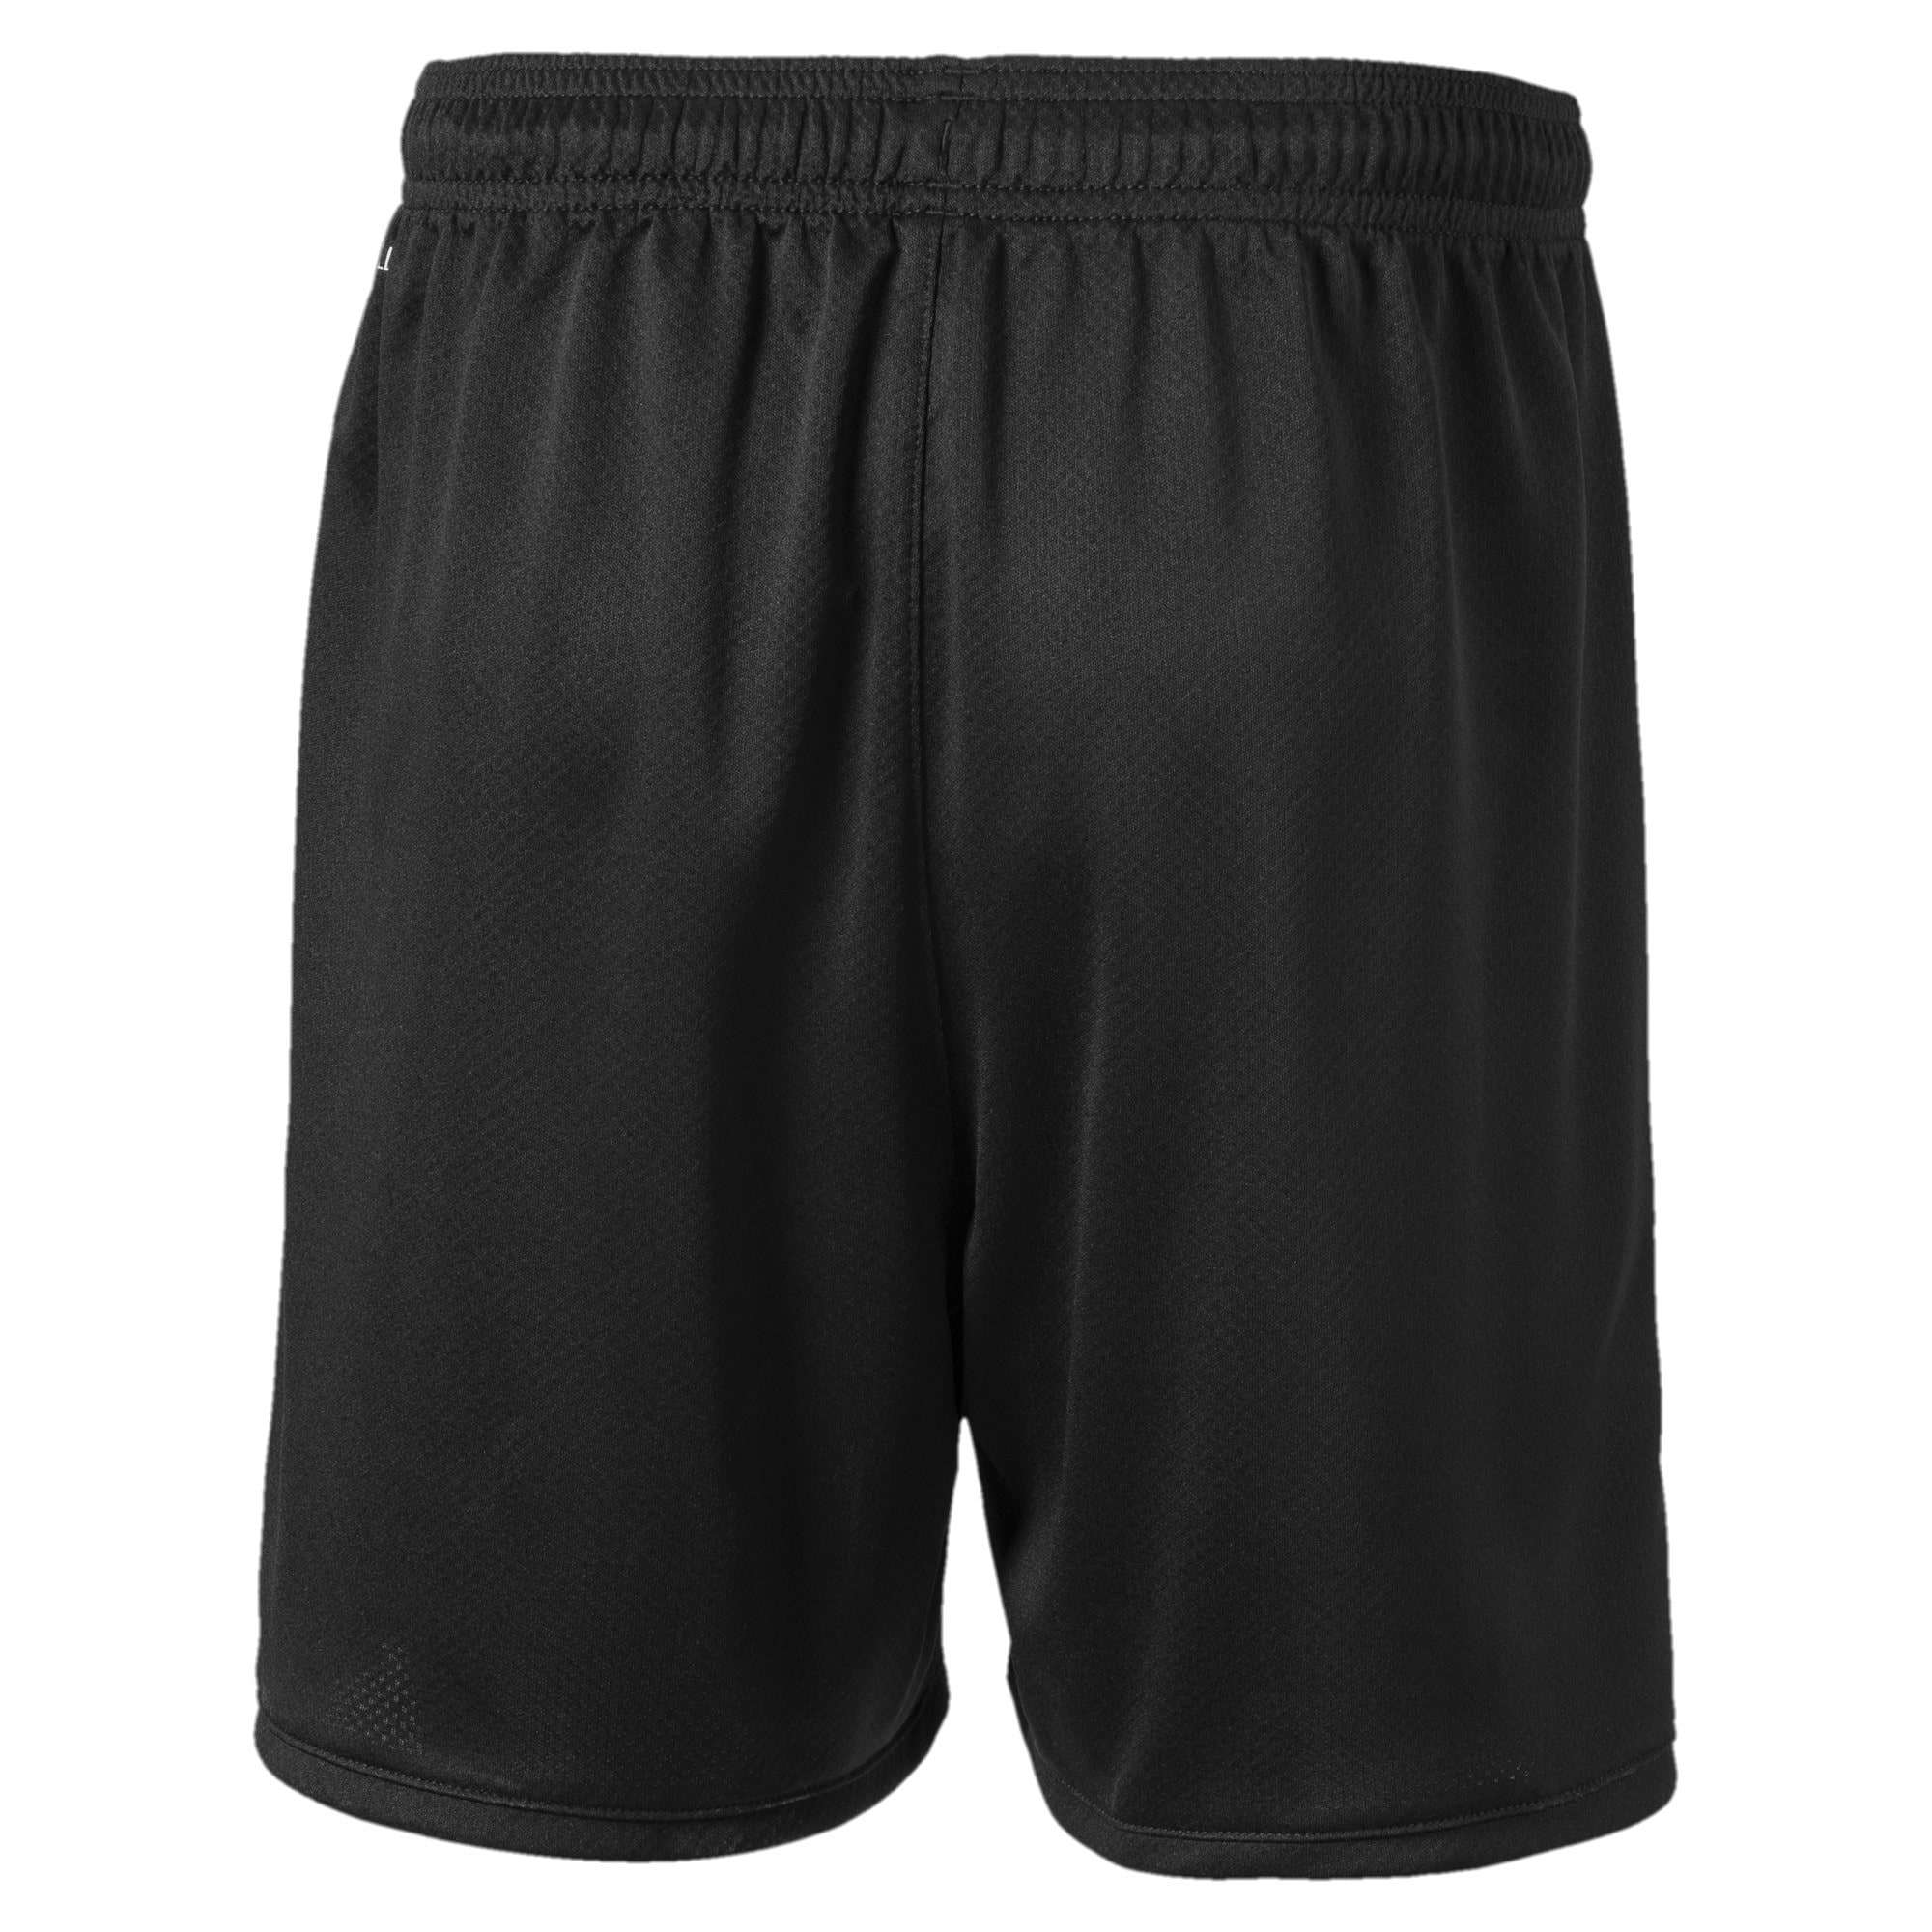 Thumbnail 2 of Manchester City FC Kids' Third Replica Shorts, Puma Black-Georgia Peach, medium